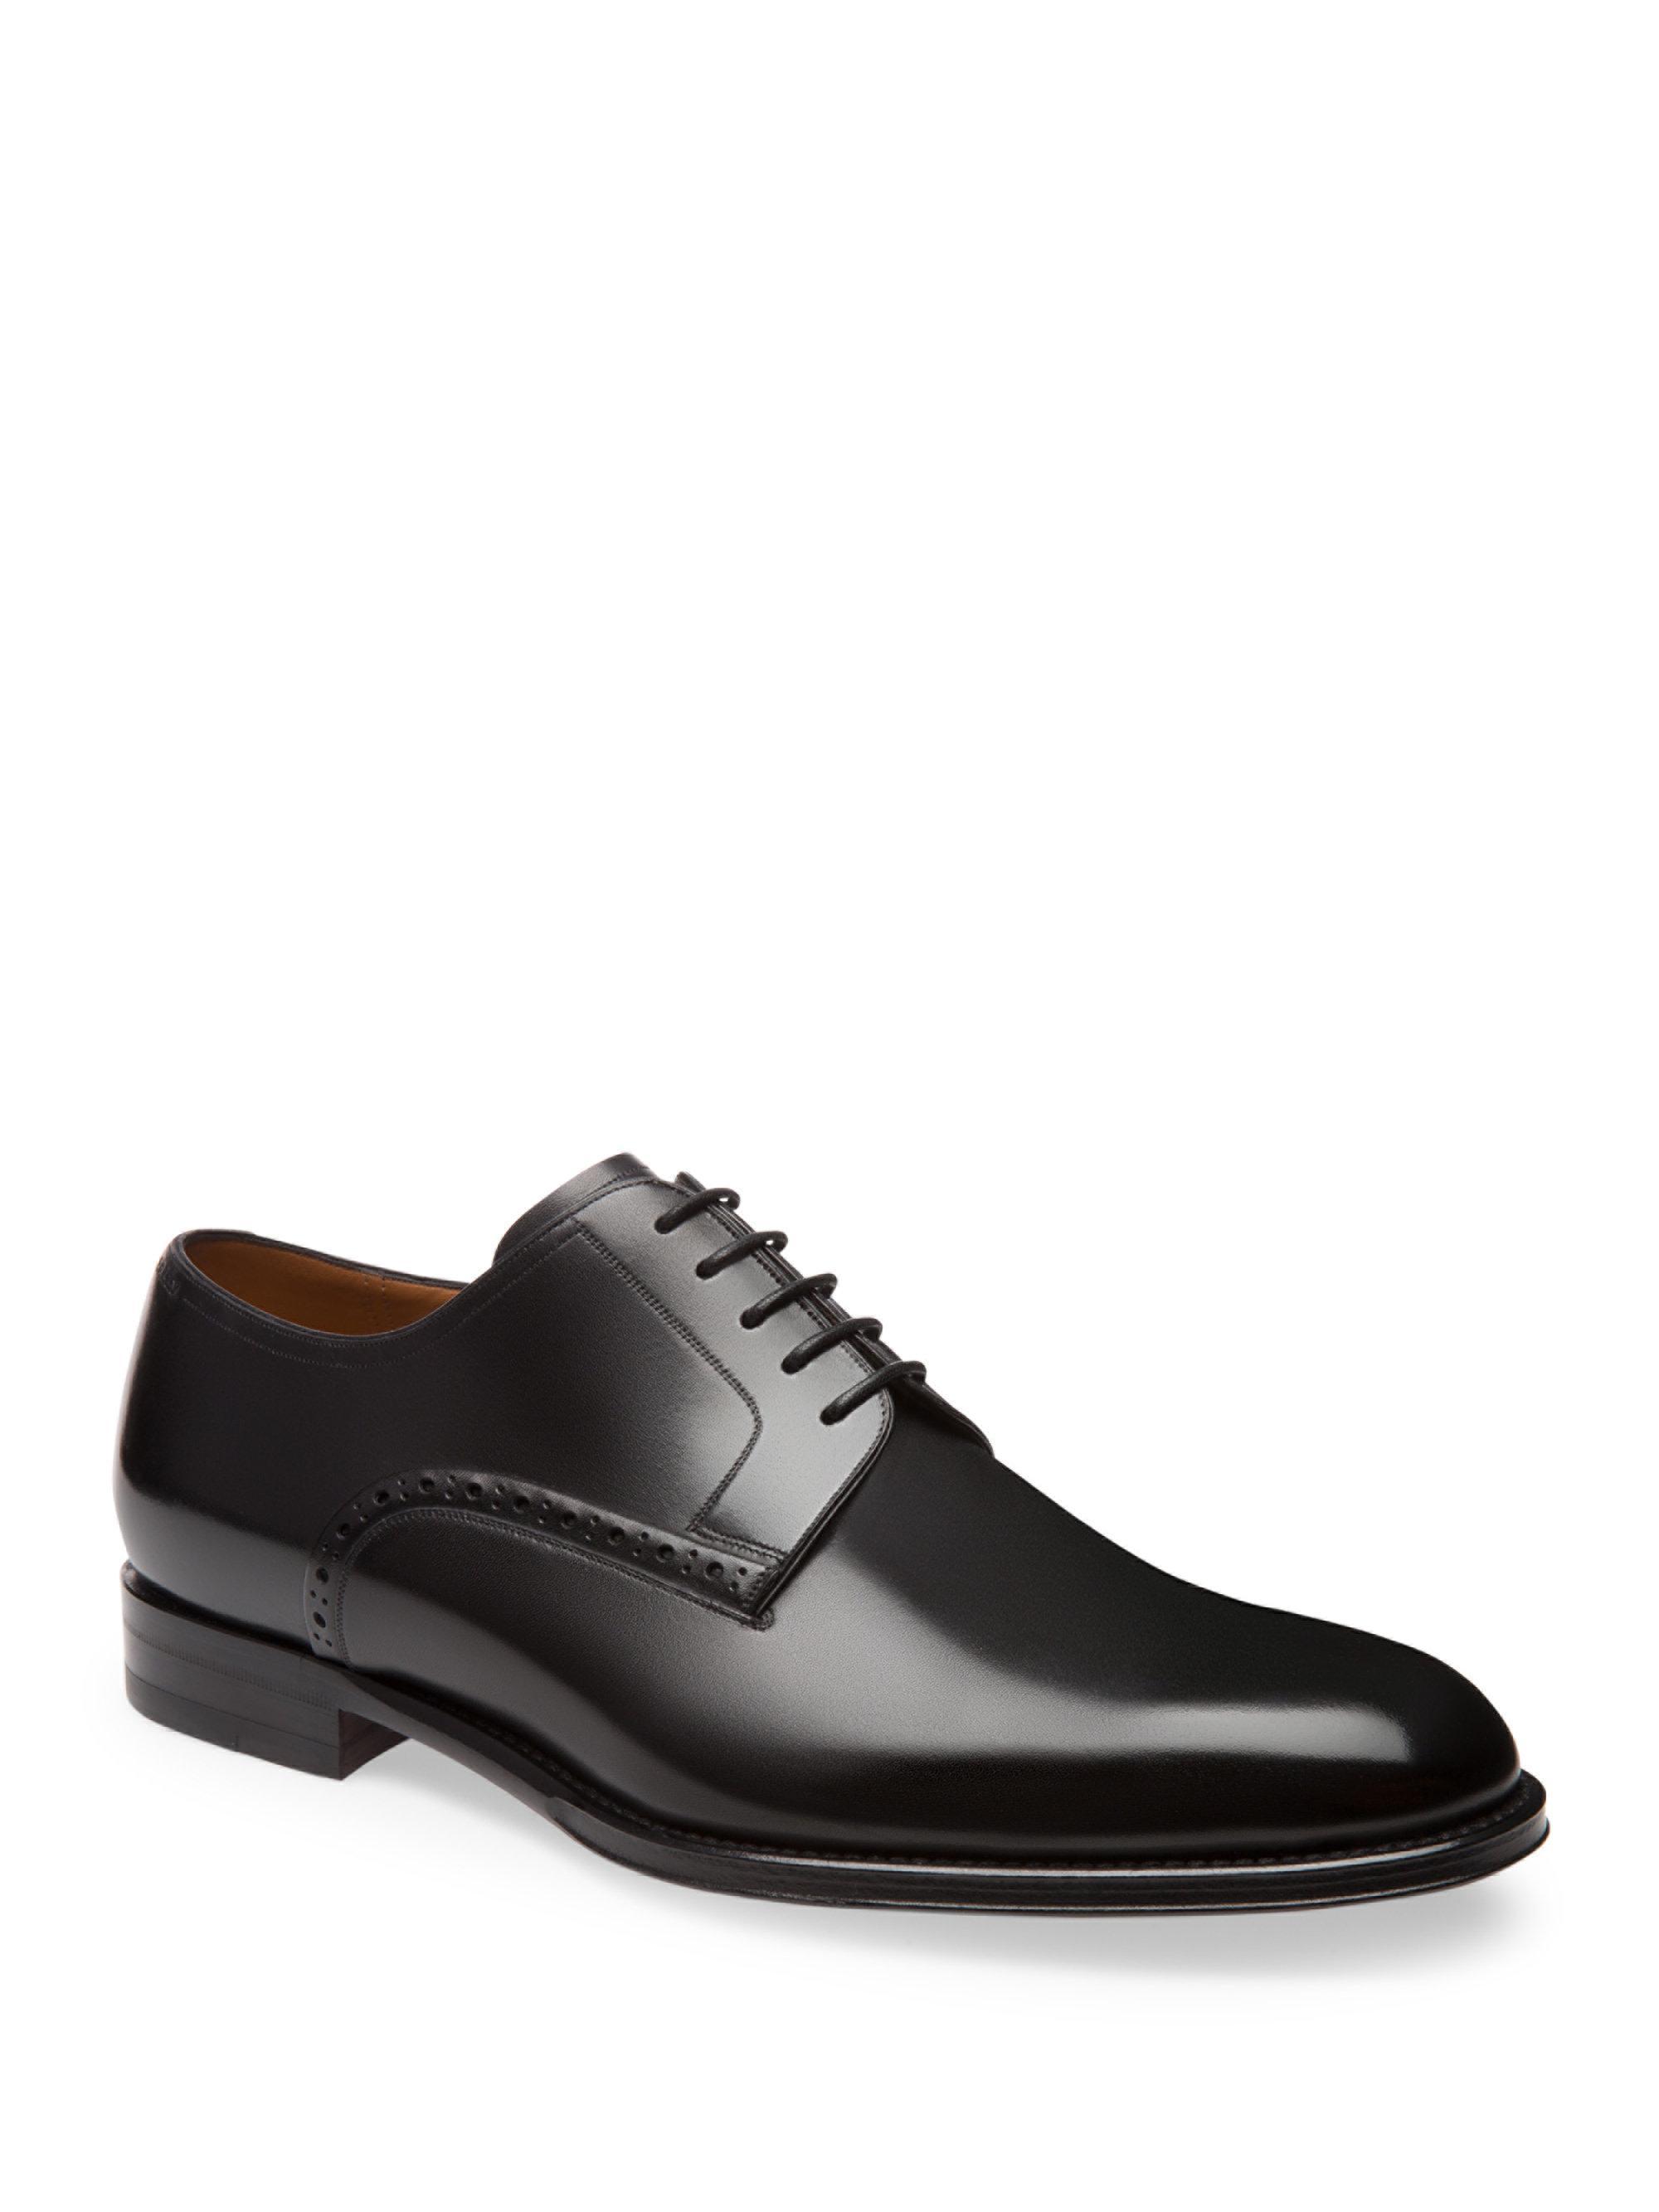 Plas Black, Mens plain calf leather oxford shoe in black Bally